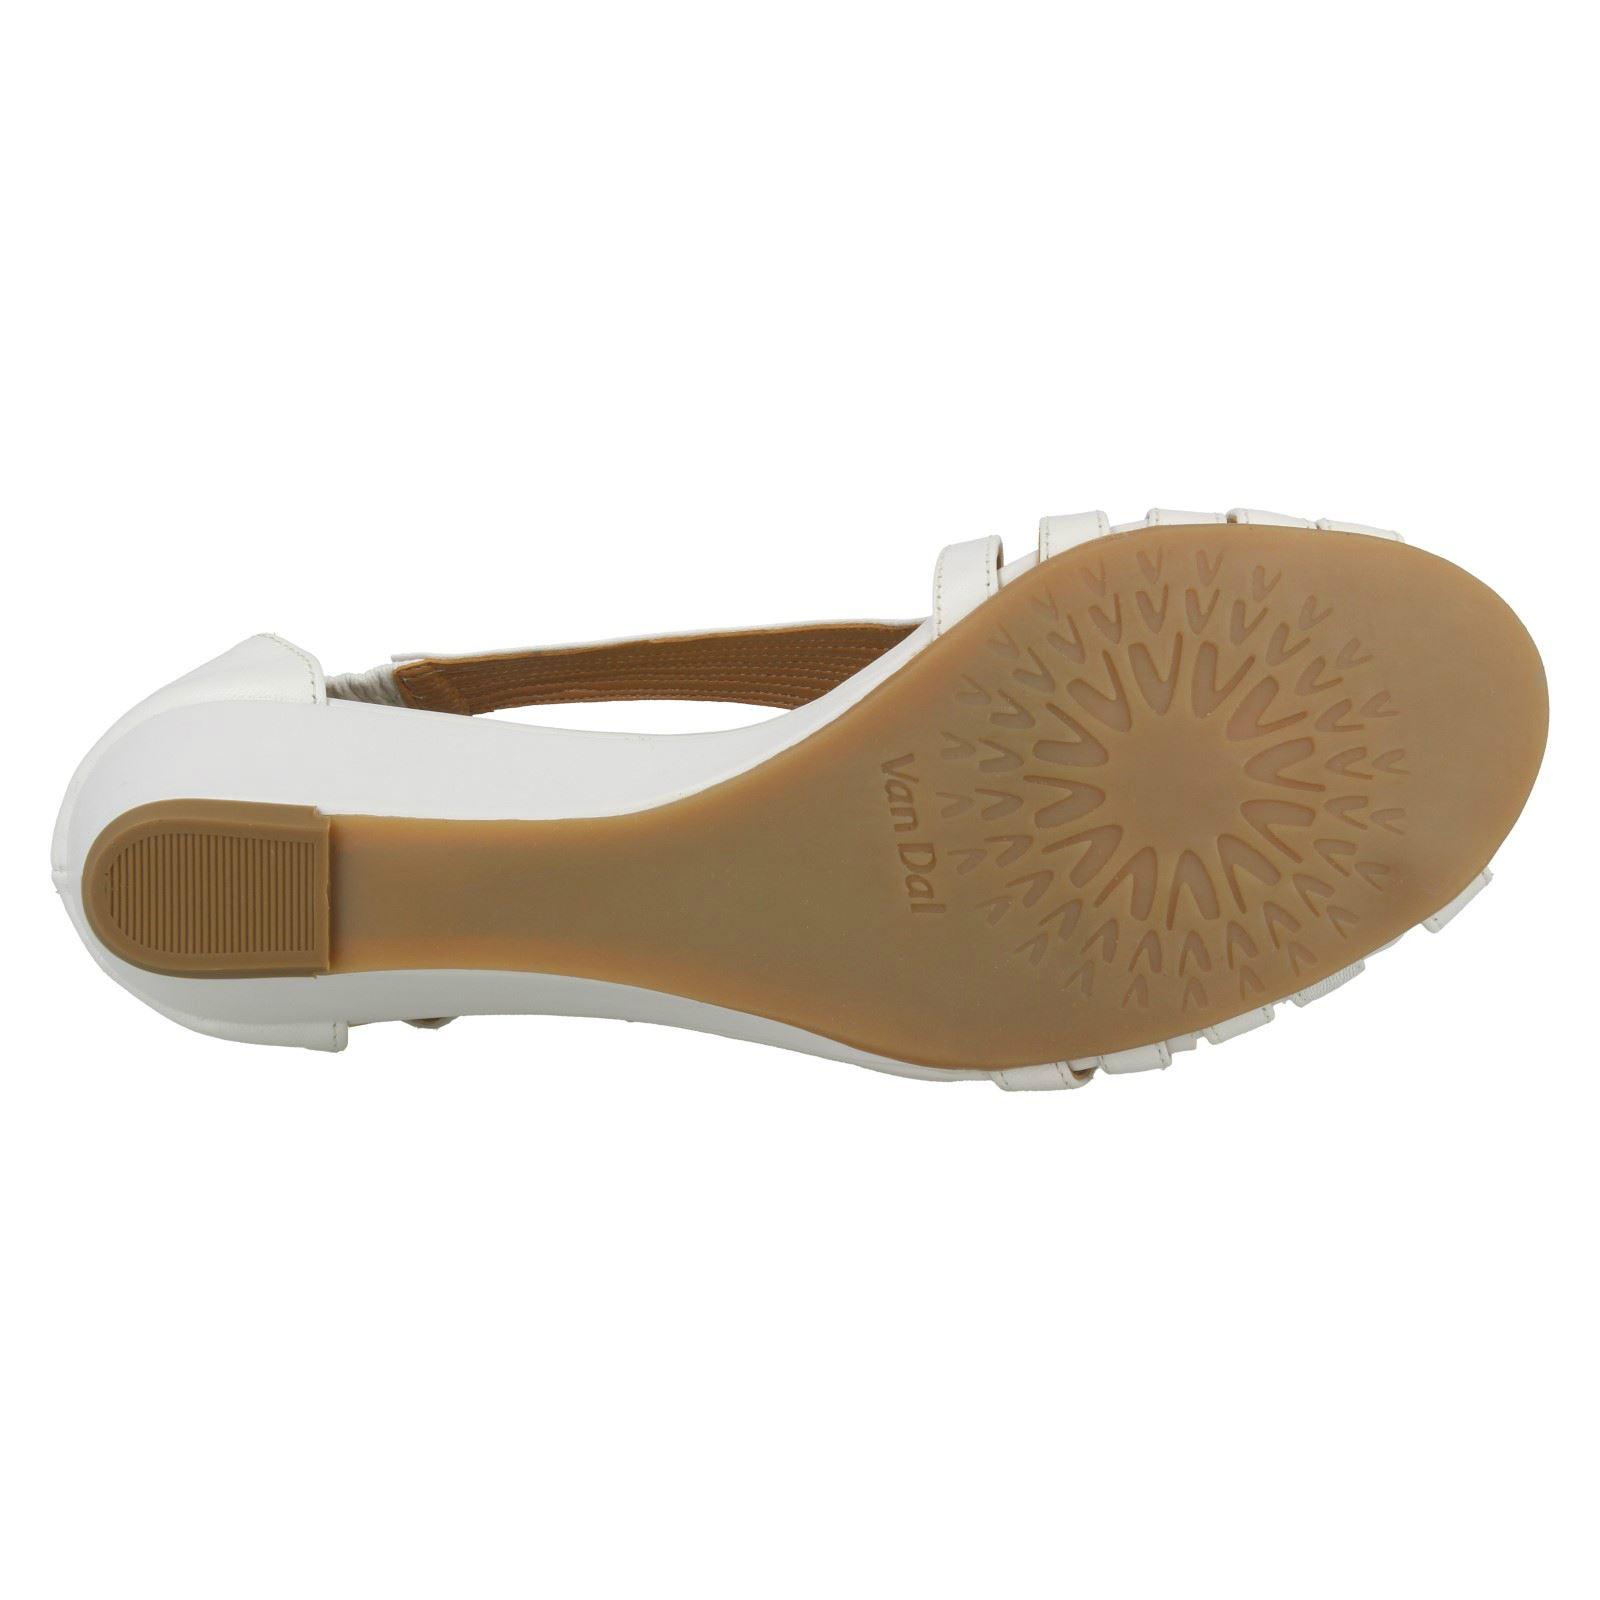 Ladies-Van-Dal-Wedge-Strappy-Sandals-Lucie thumbnail 18